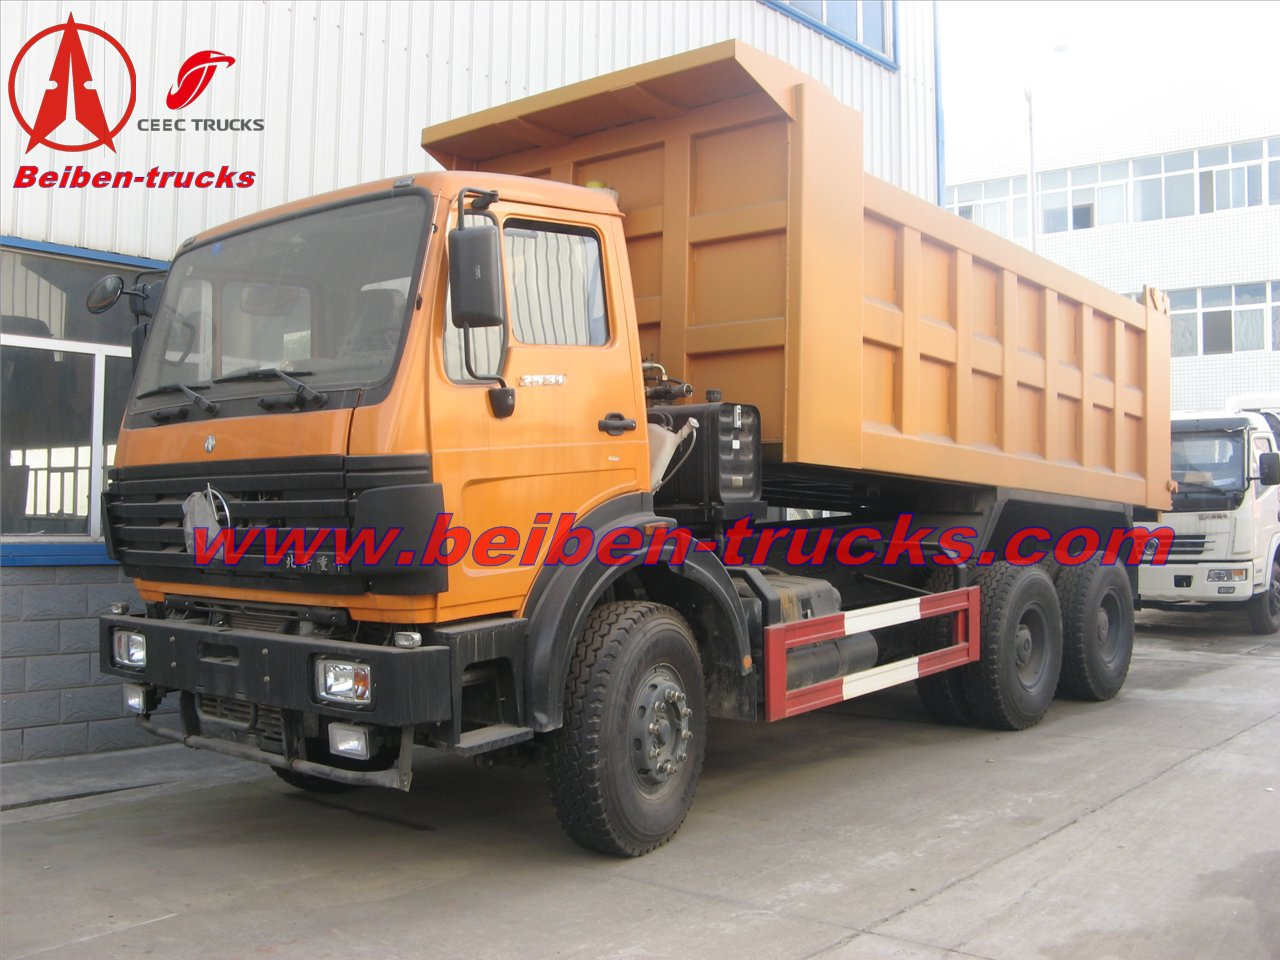 buy best beiben 40 ton dump truck 6x4 new truck price beiben 40 ton dump truck 6x4 new truck. Black Bedroom Furniture Sets. Home Design Ideas